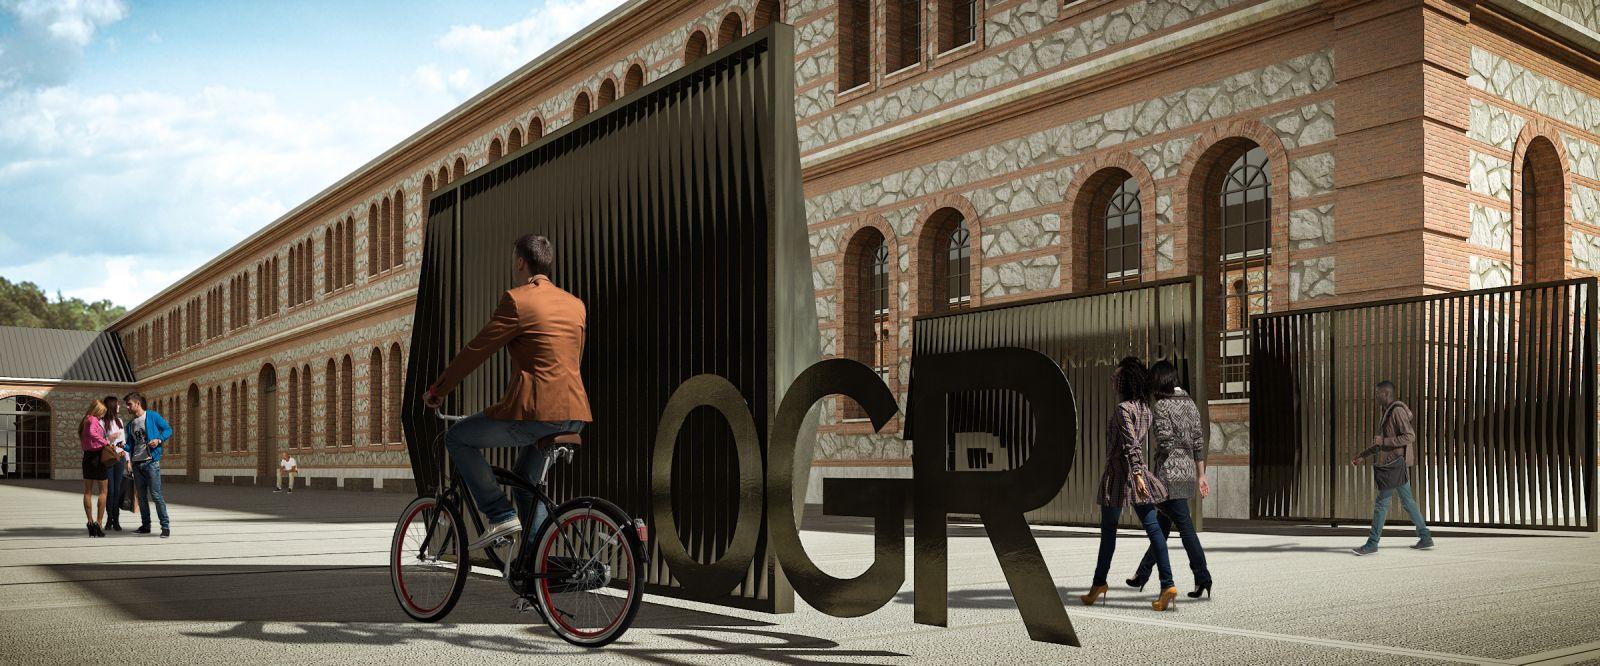 OGR - Turin 374